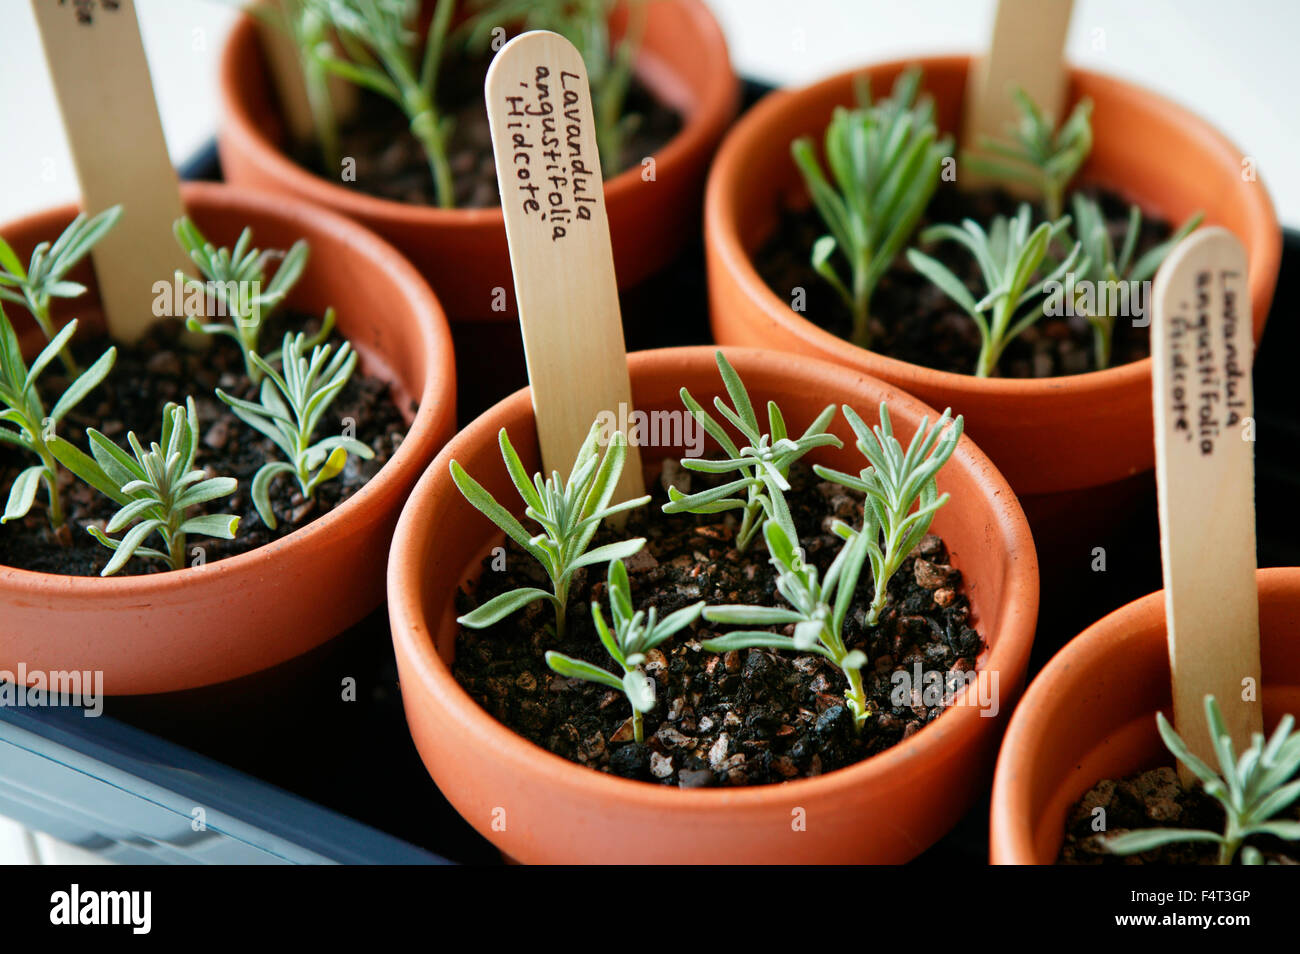 Vermehrung Von Lavendel Lavandula Angustifolia Hidcote Tablett